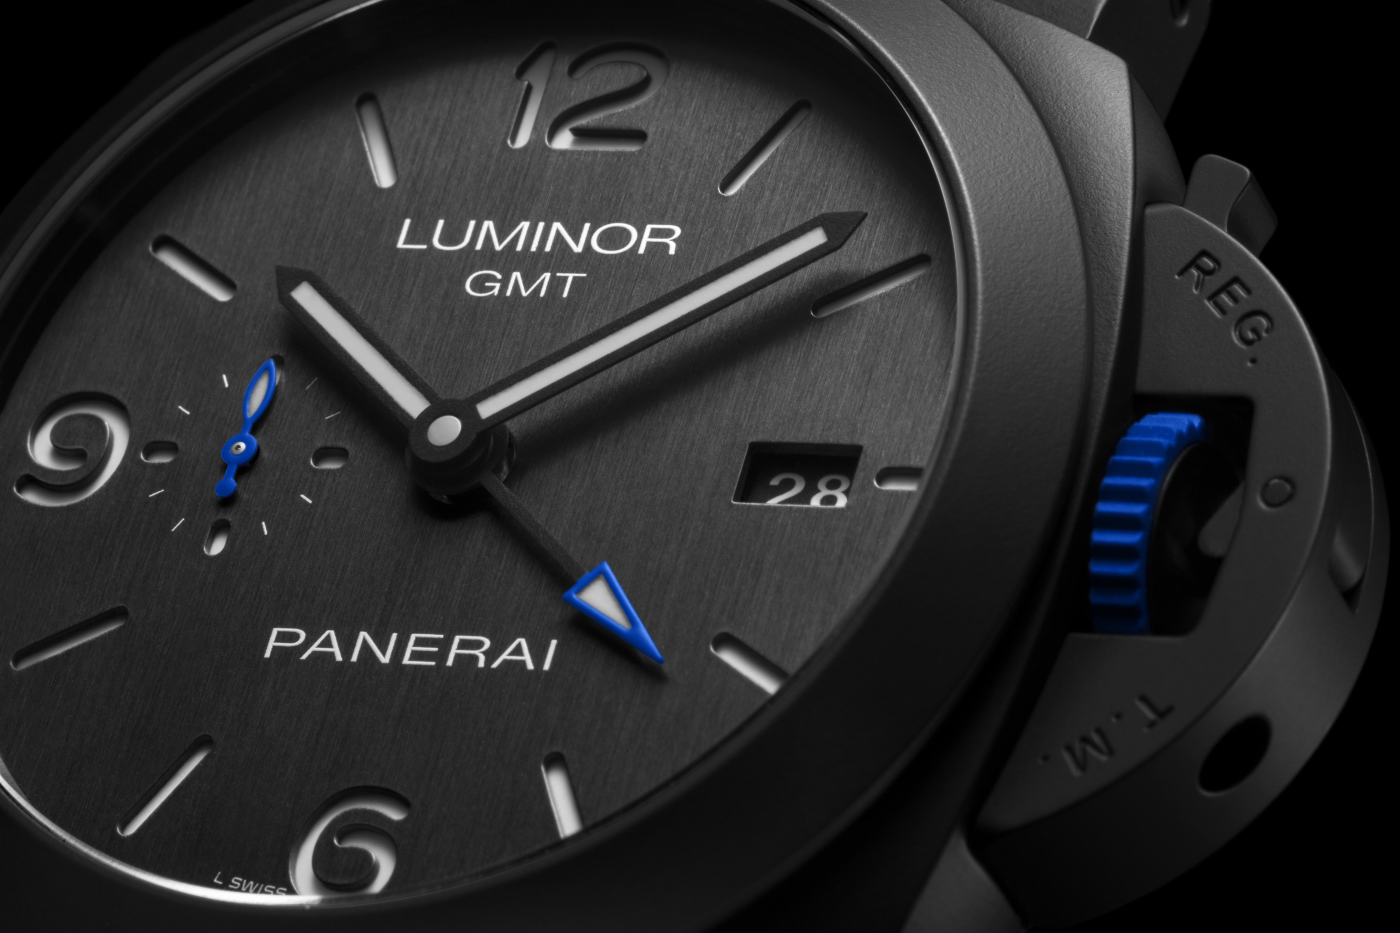 Panerai_luminor_gmt_Bucherer_blue_2_-_Europa_Star_watch_magazine_2020